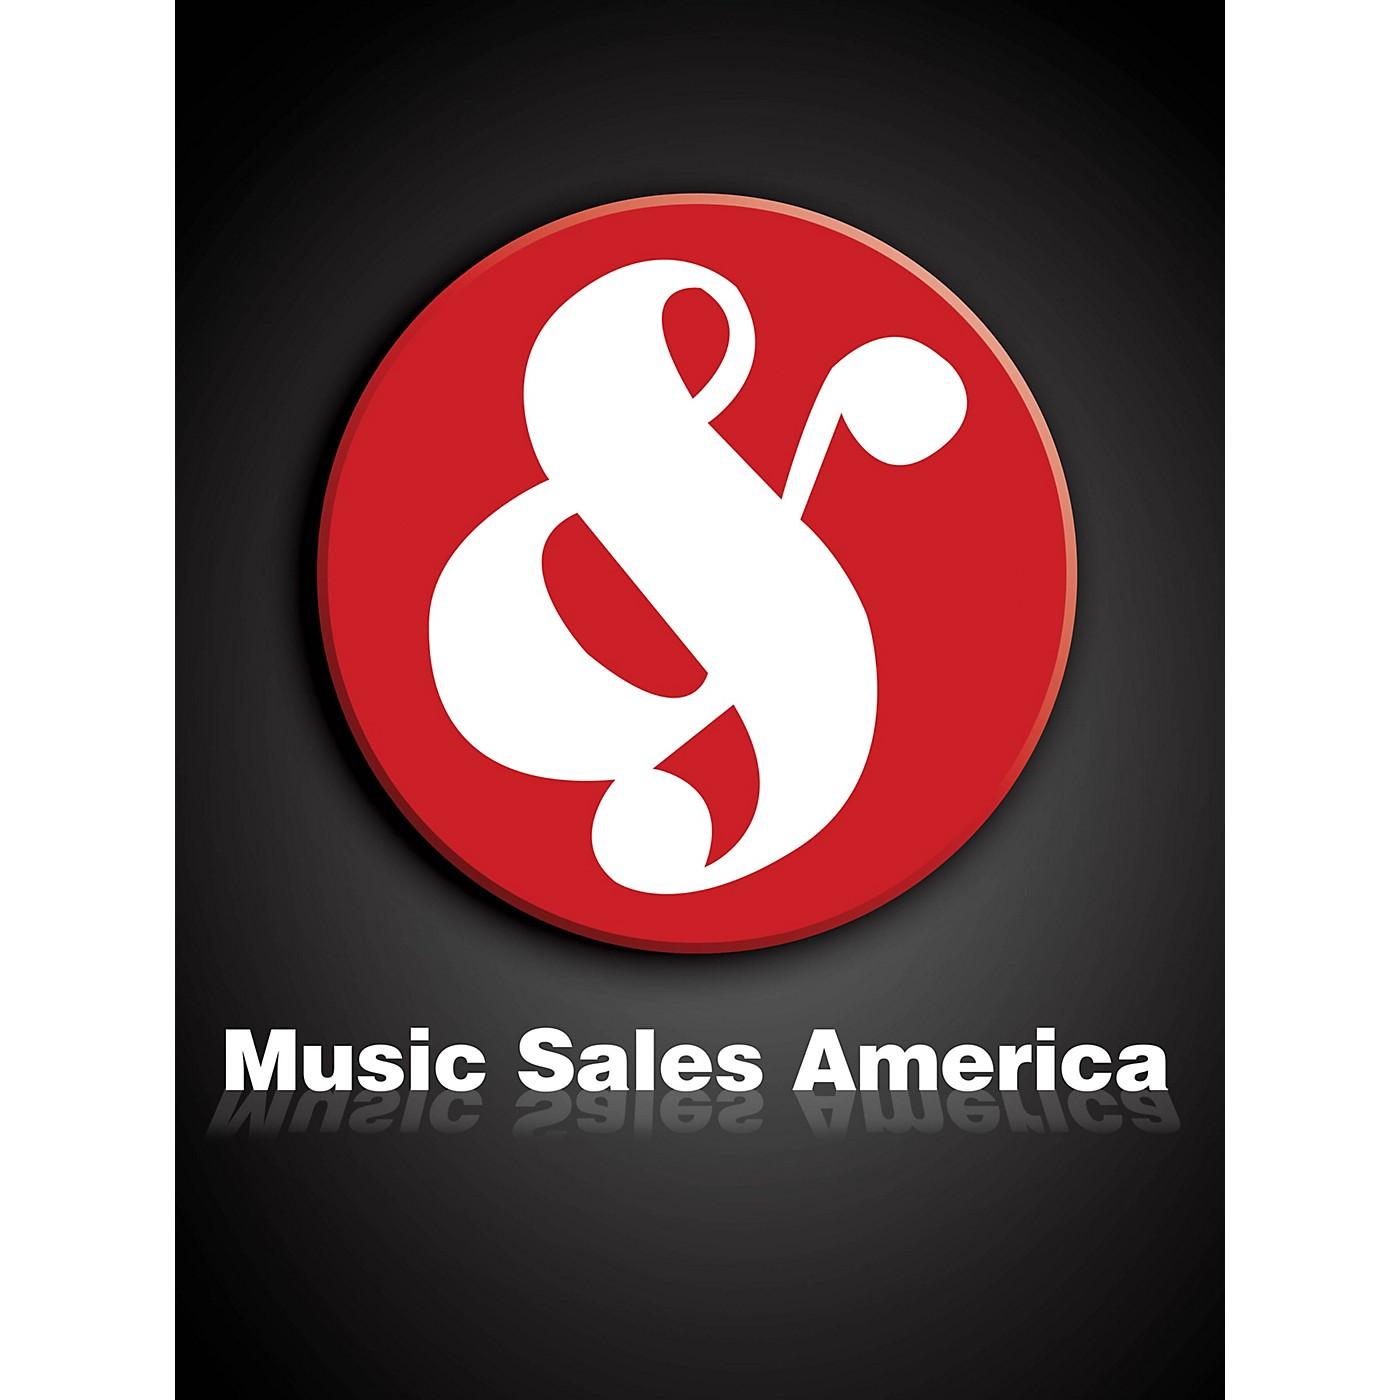 Hal Leonard Ave Verum Corpus (SATB a cappella) SATB a cappella Composed by Paul Mealor thumbnail